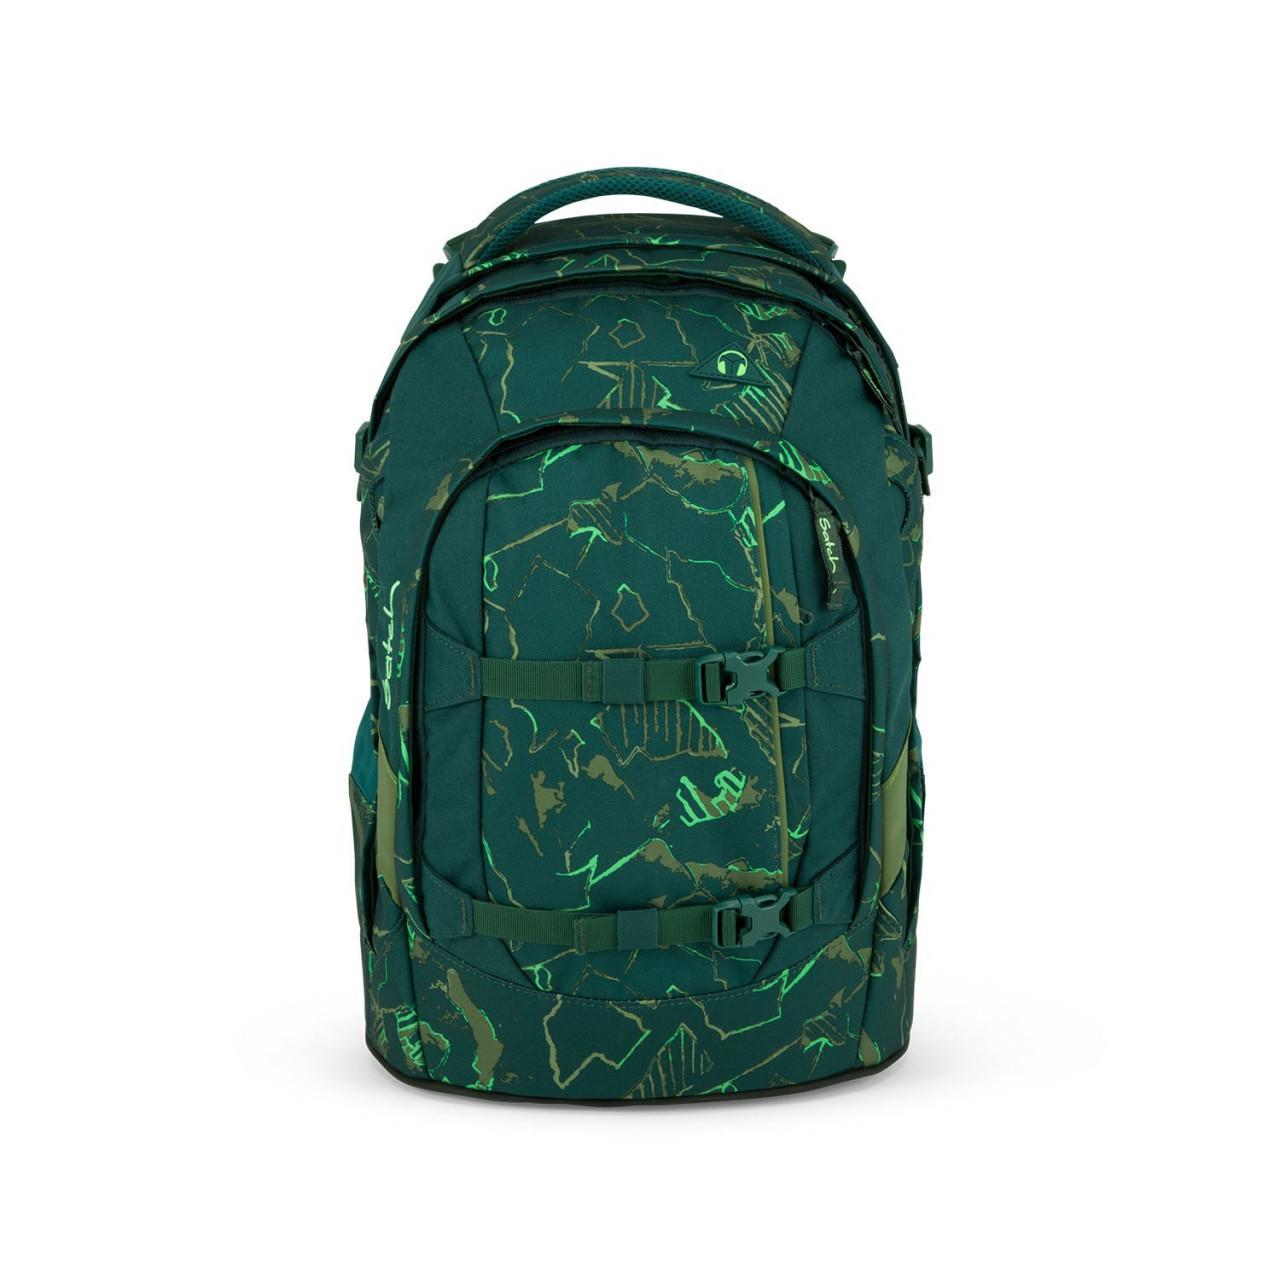 ergobag Satch Pack Green Compass